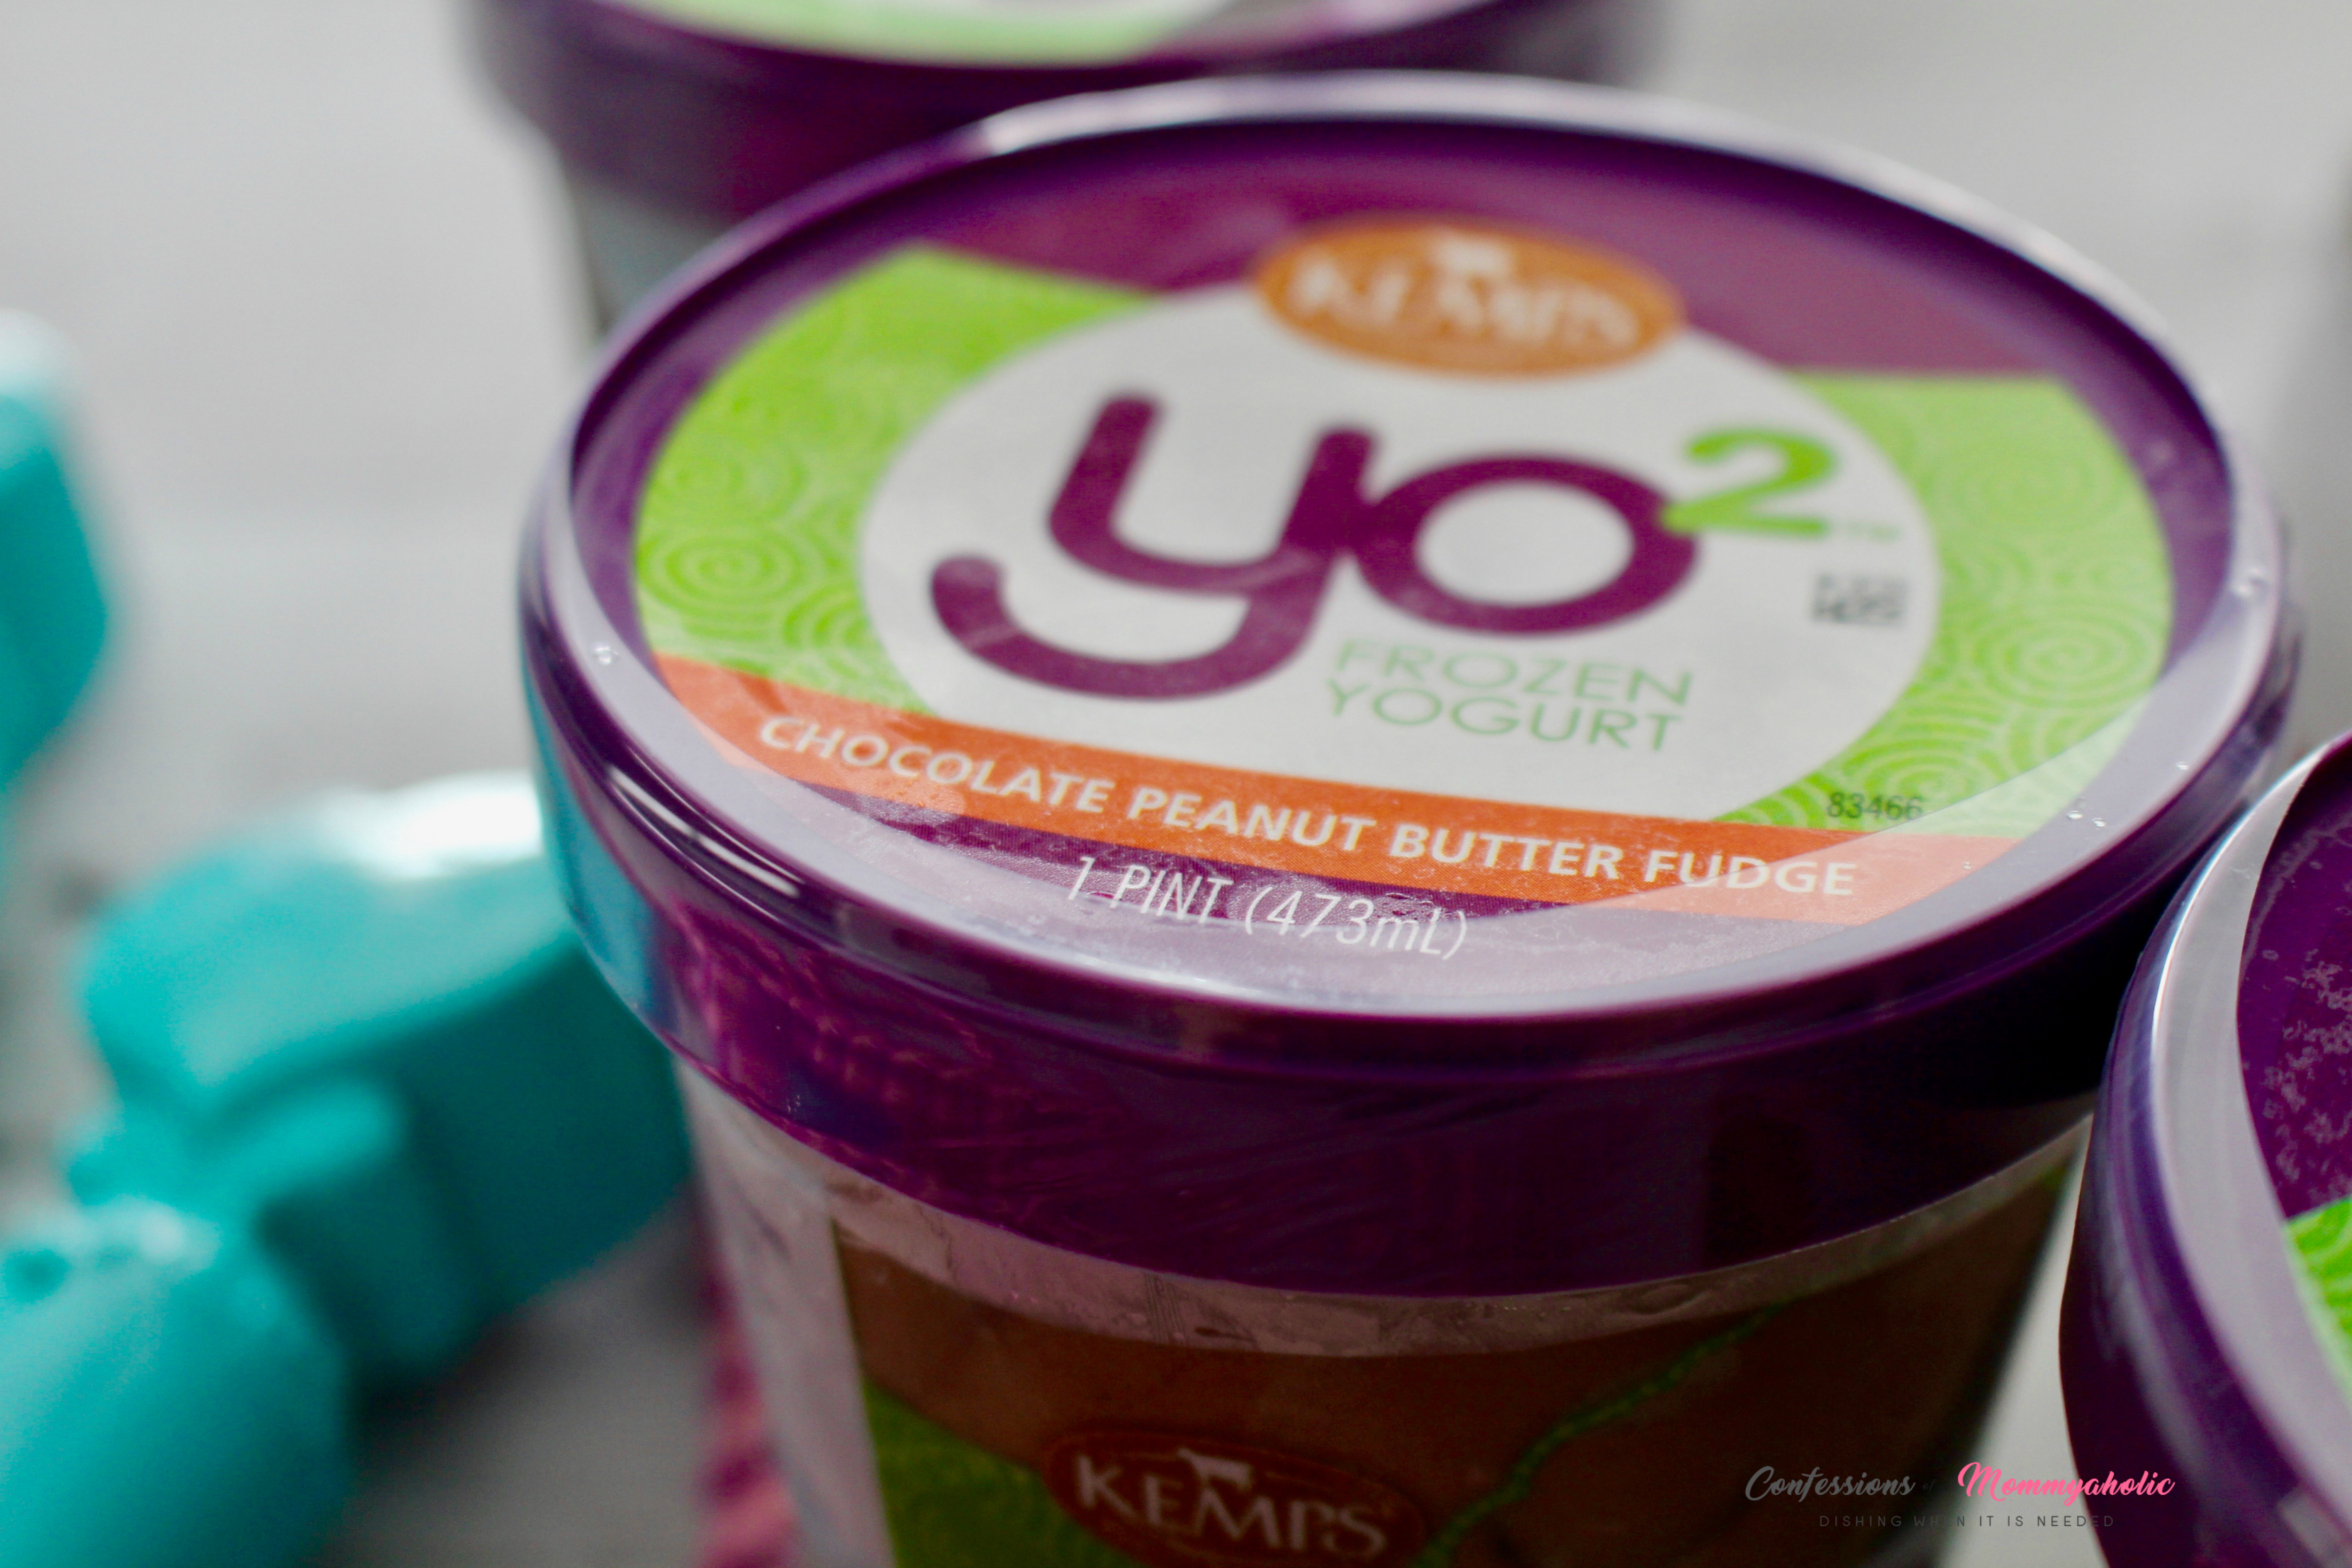 Kemps YO2 Chocolate Peanut Butter Fudge Frozen Yogurt